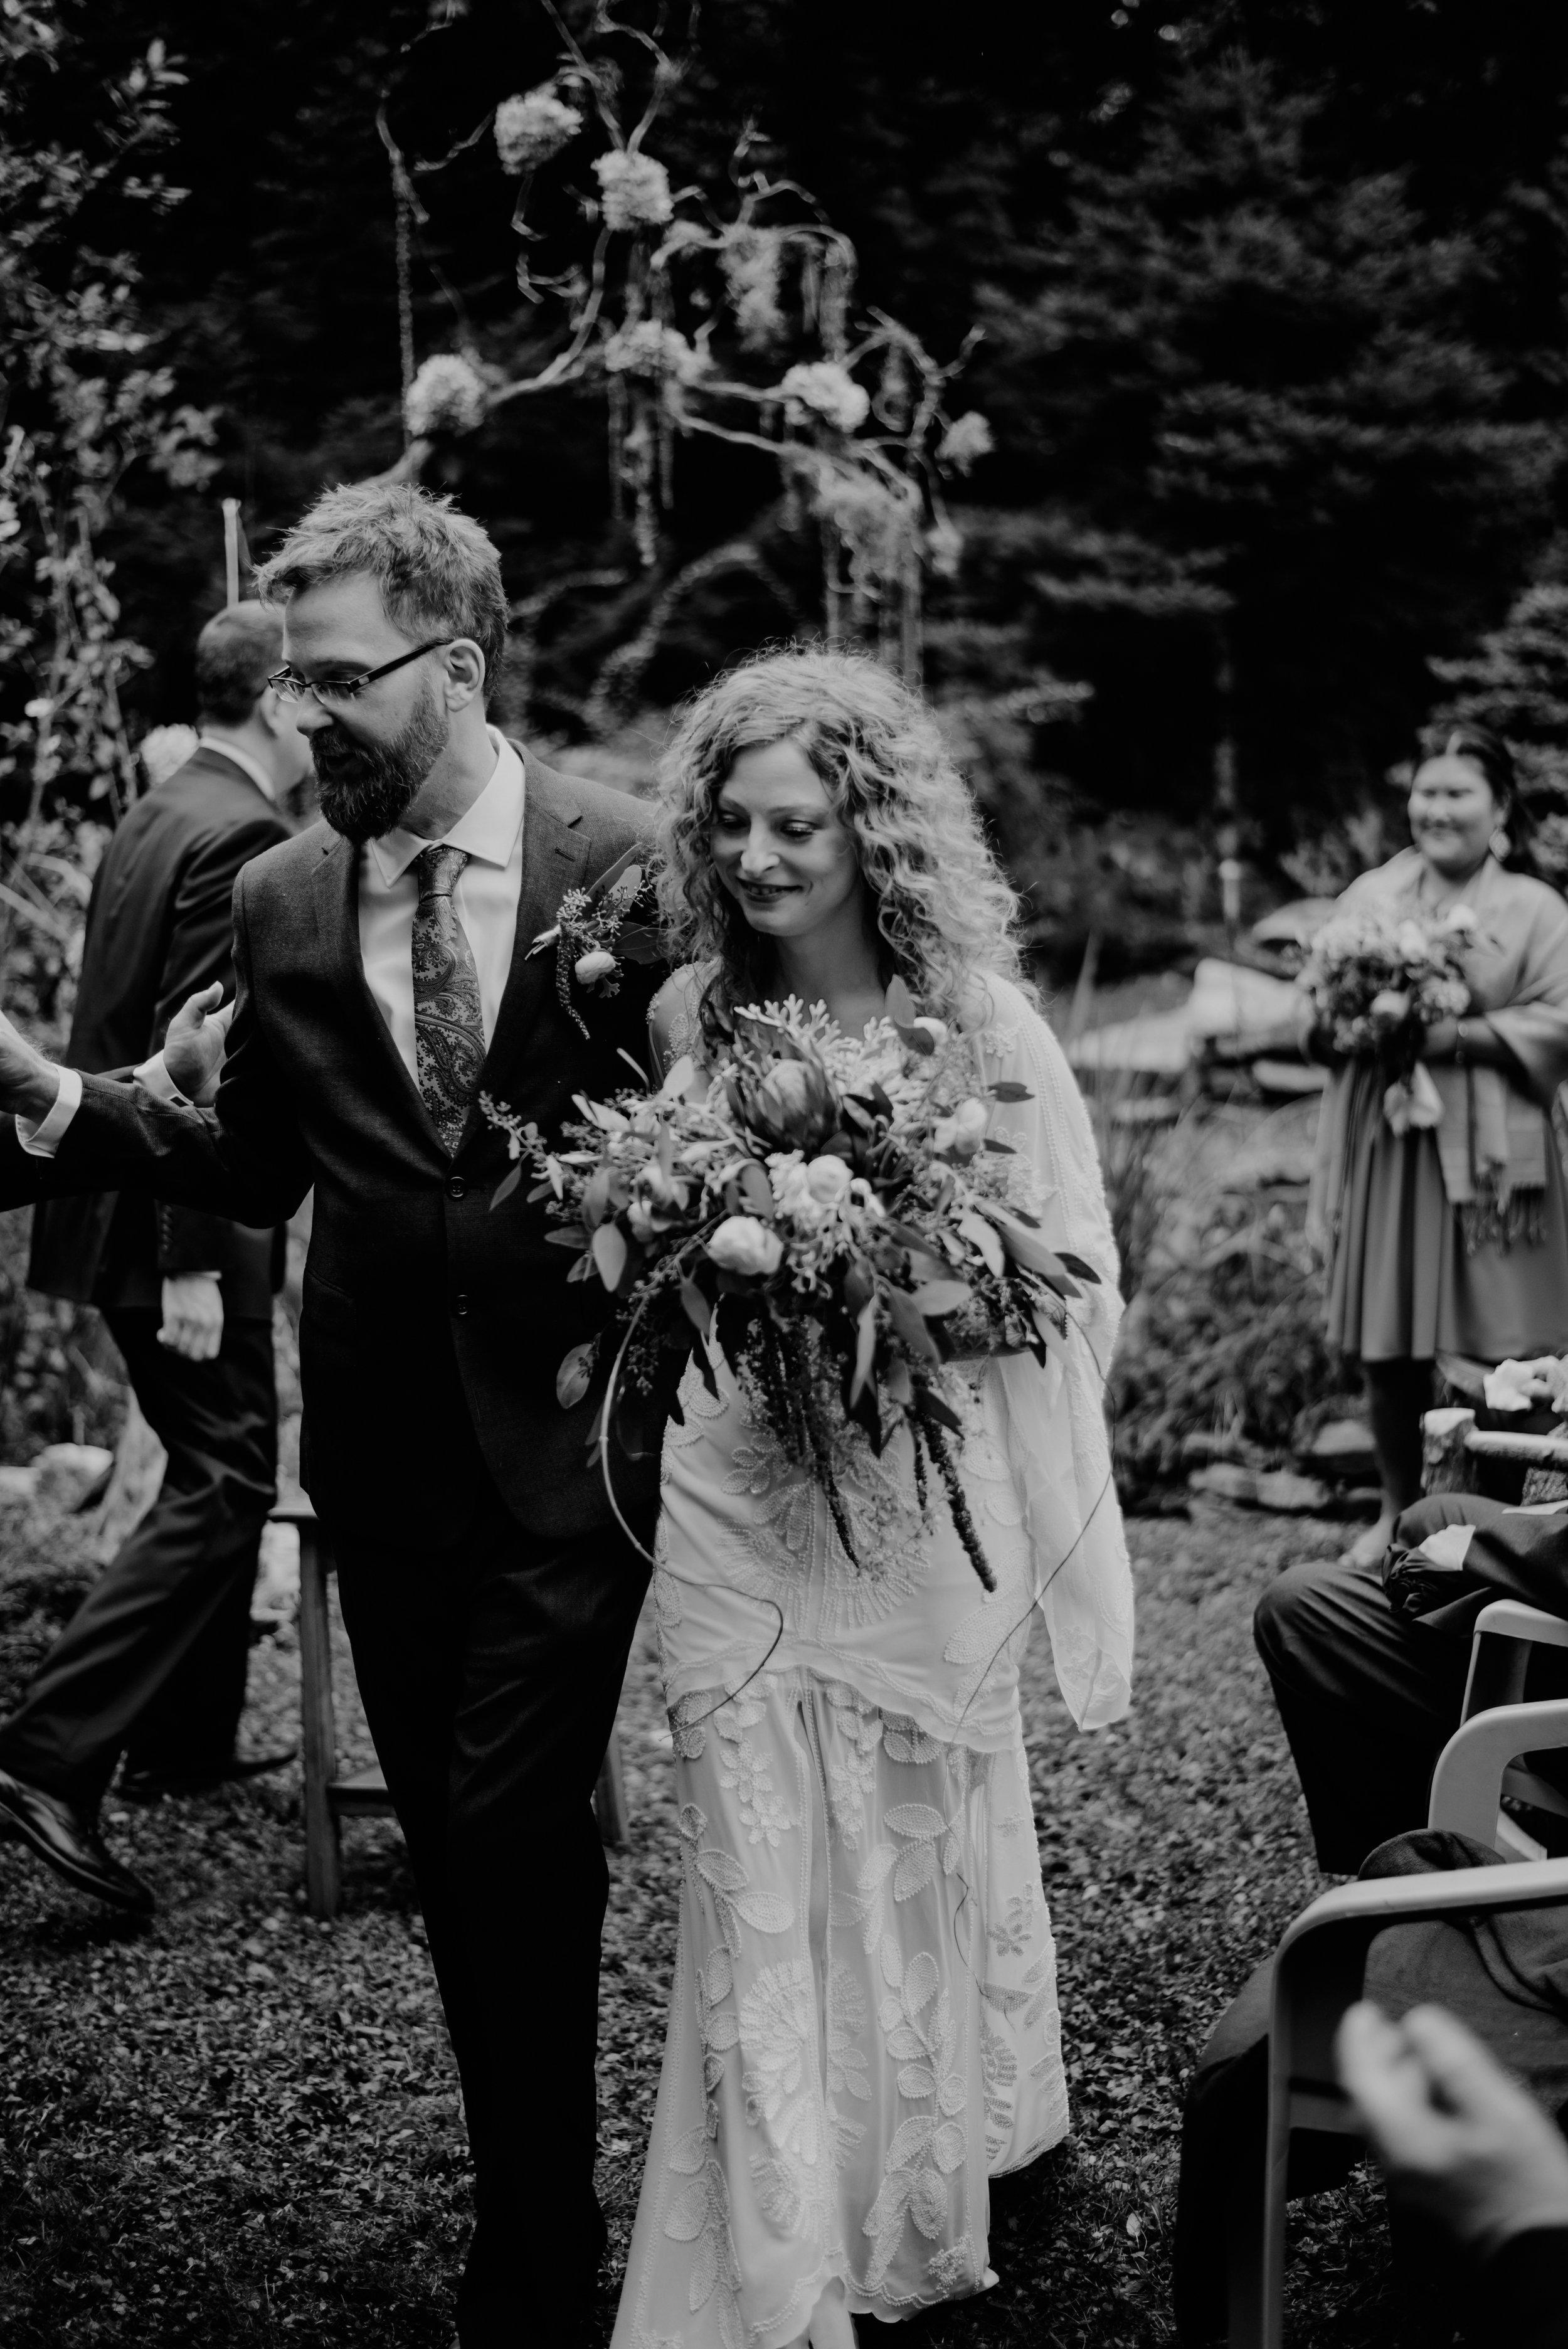 wildsoulsstudio-woodland-intimate-newengland-wedding-lake willoughby-100.jpg